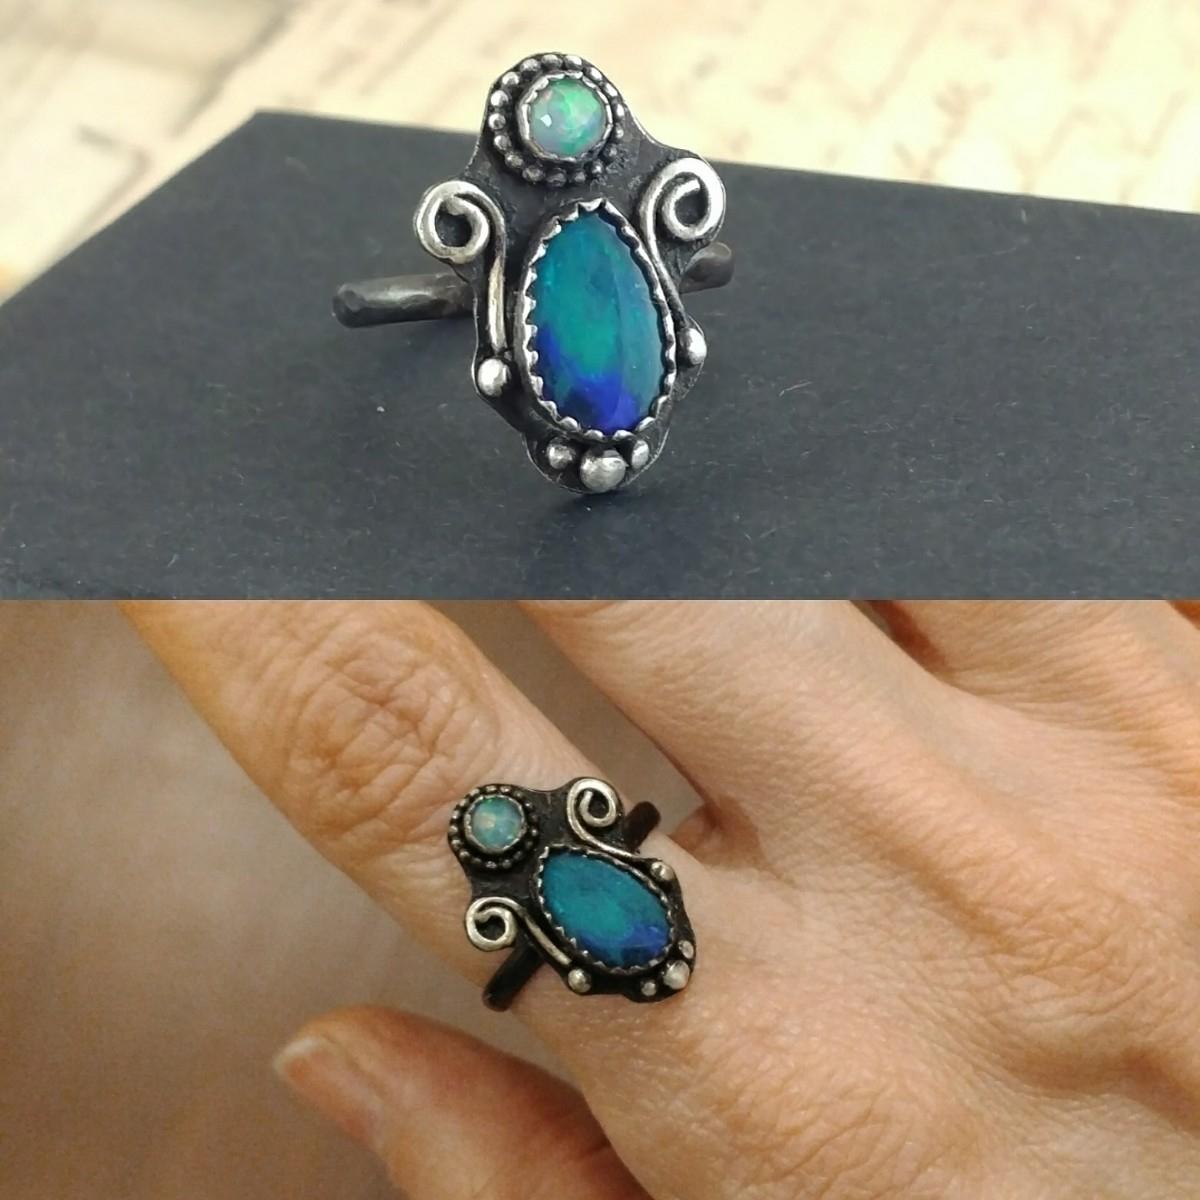 excited share beautiful ring wh - inspiredbyelizabeth   ello